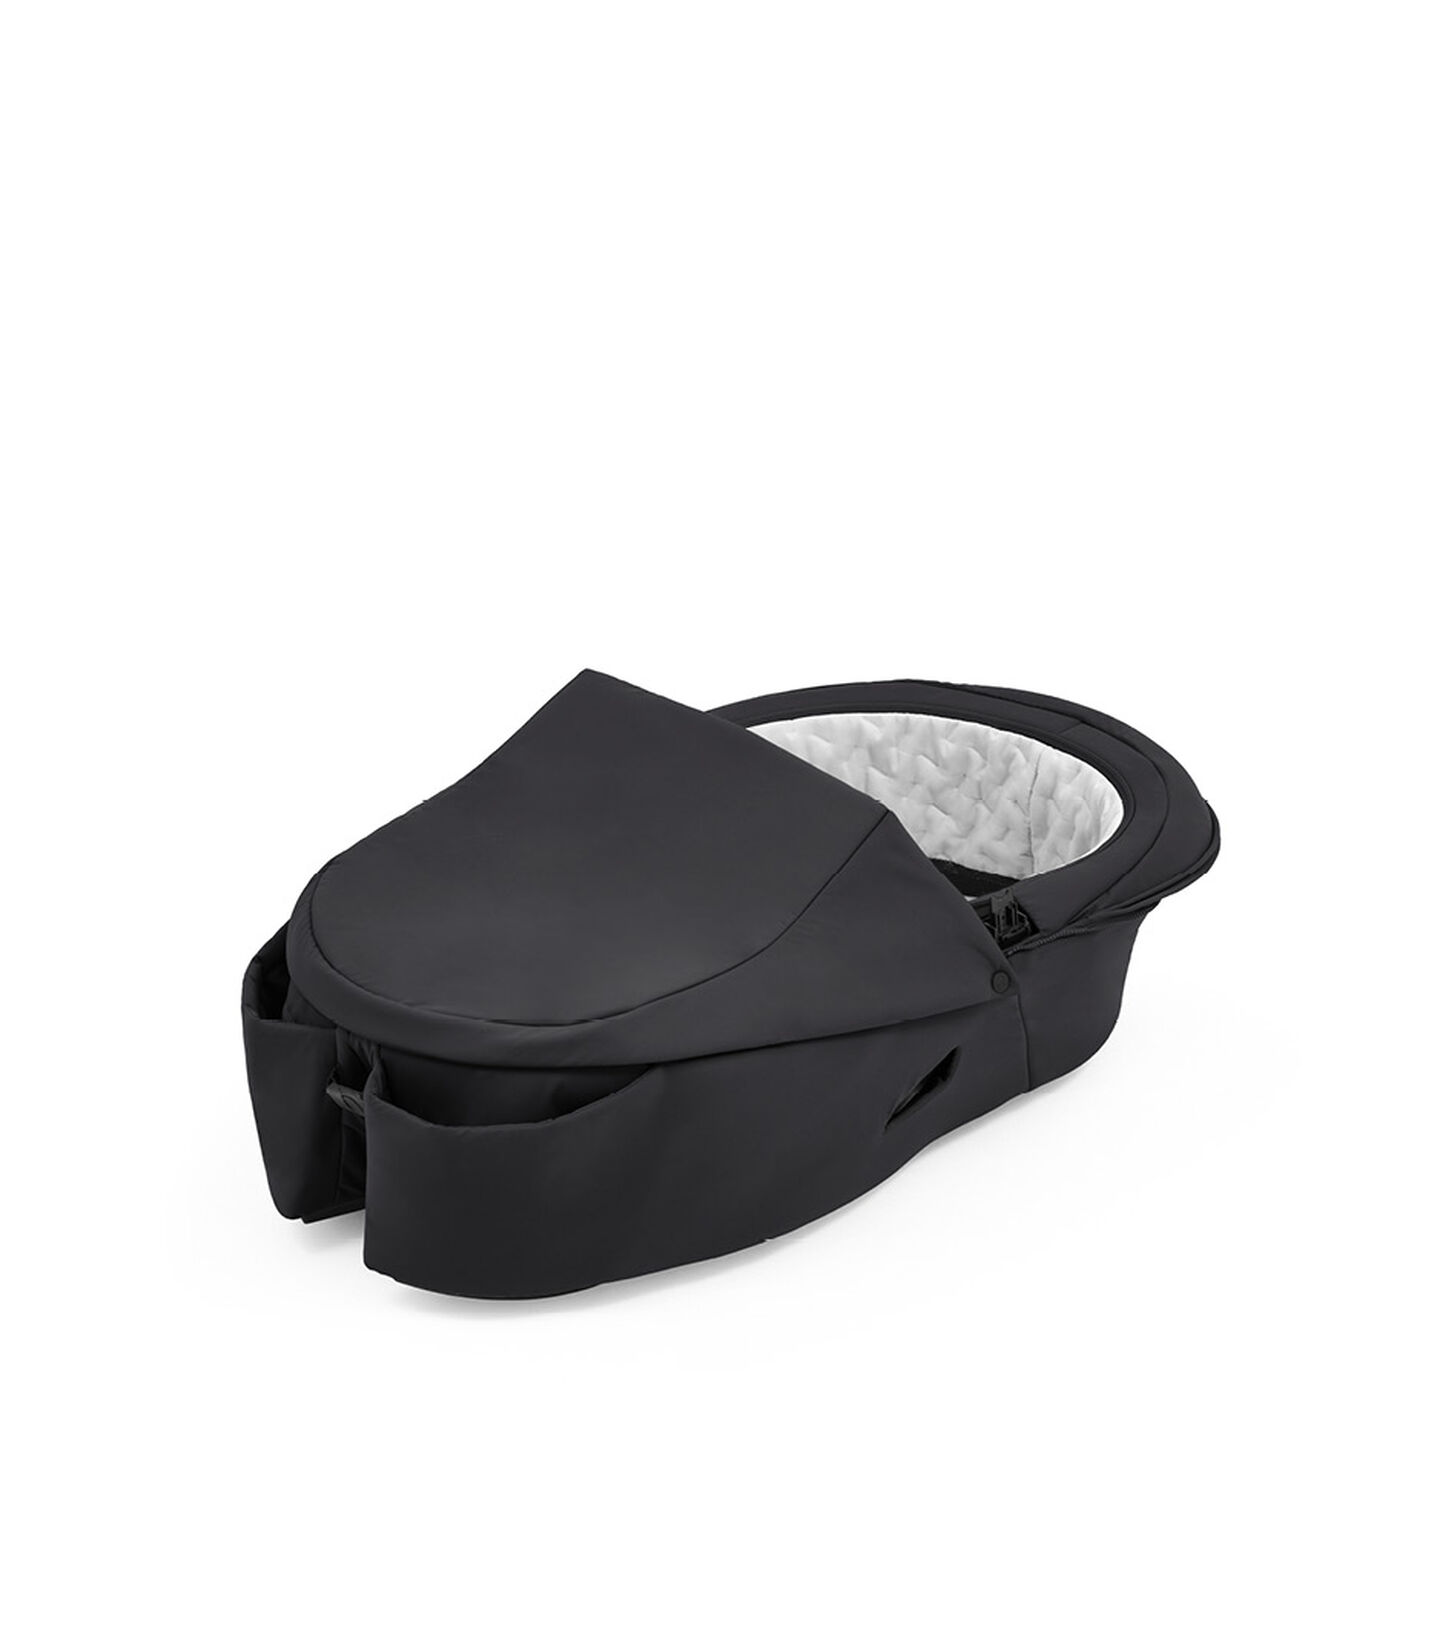 Stokke® Xplory® X Rich Black Carry Cot, no canopy. view 2